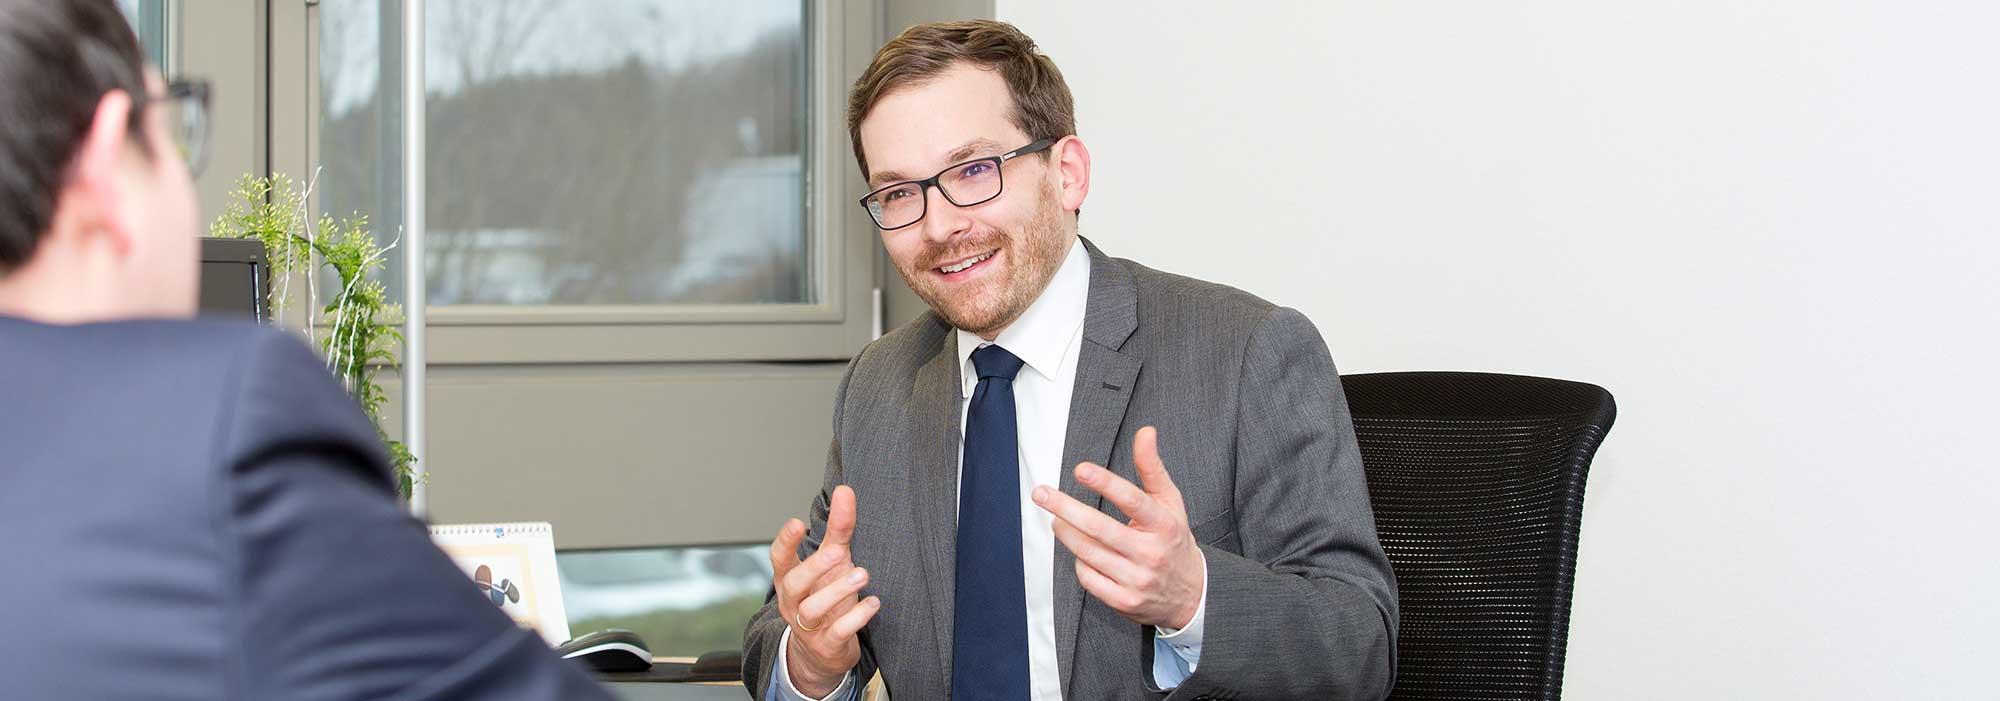 Paul-Albert Schullerus, Rechtsanwalt, Spezialist fürSozialrecht